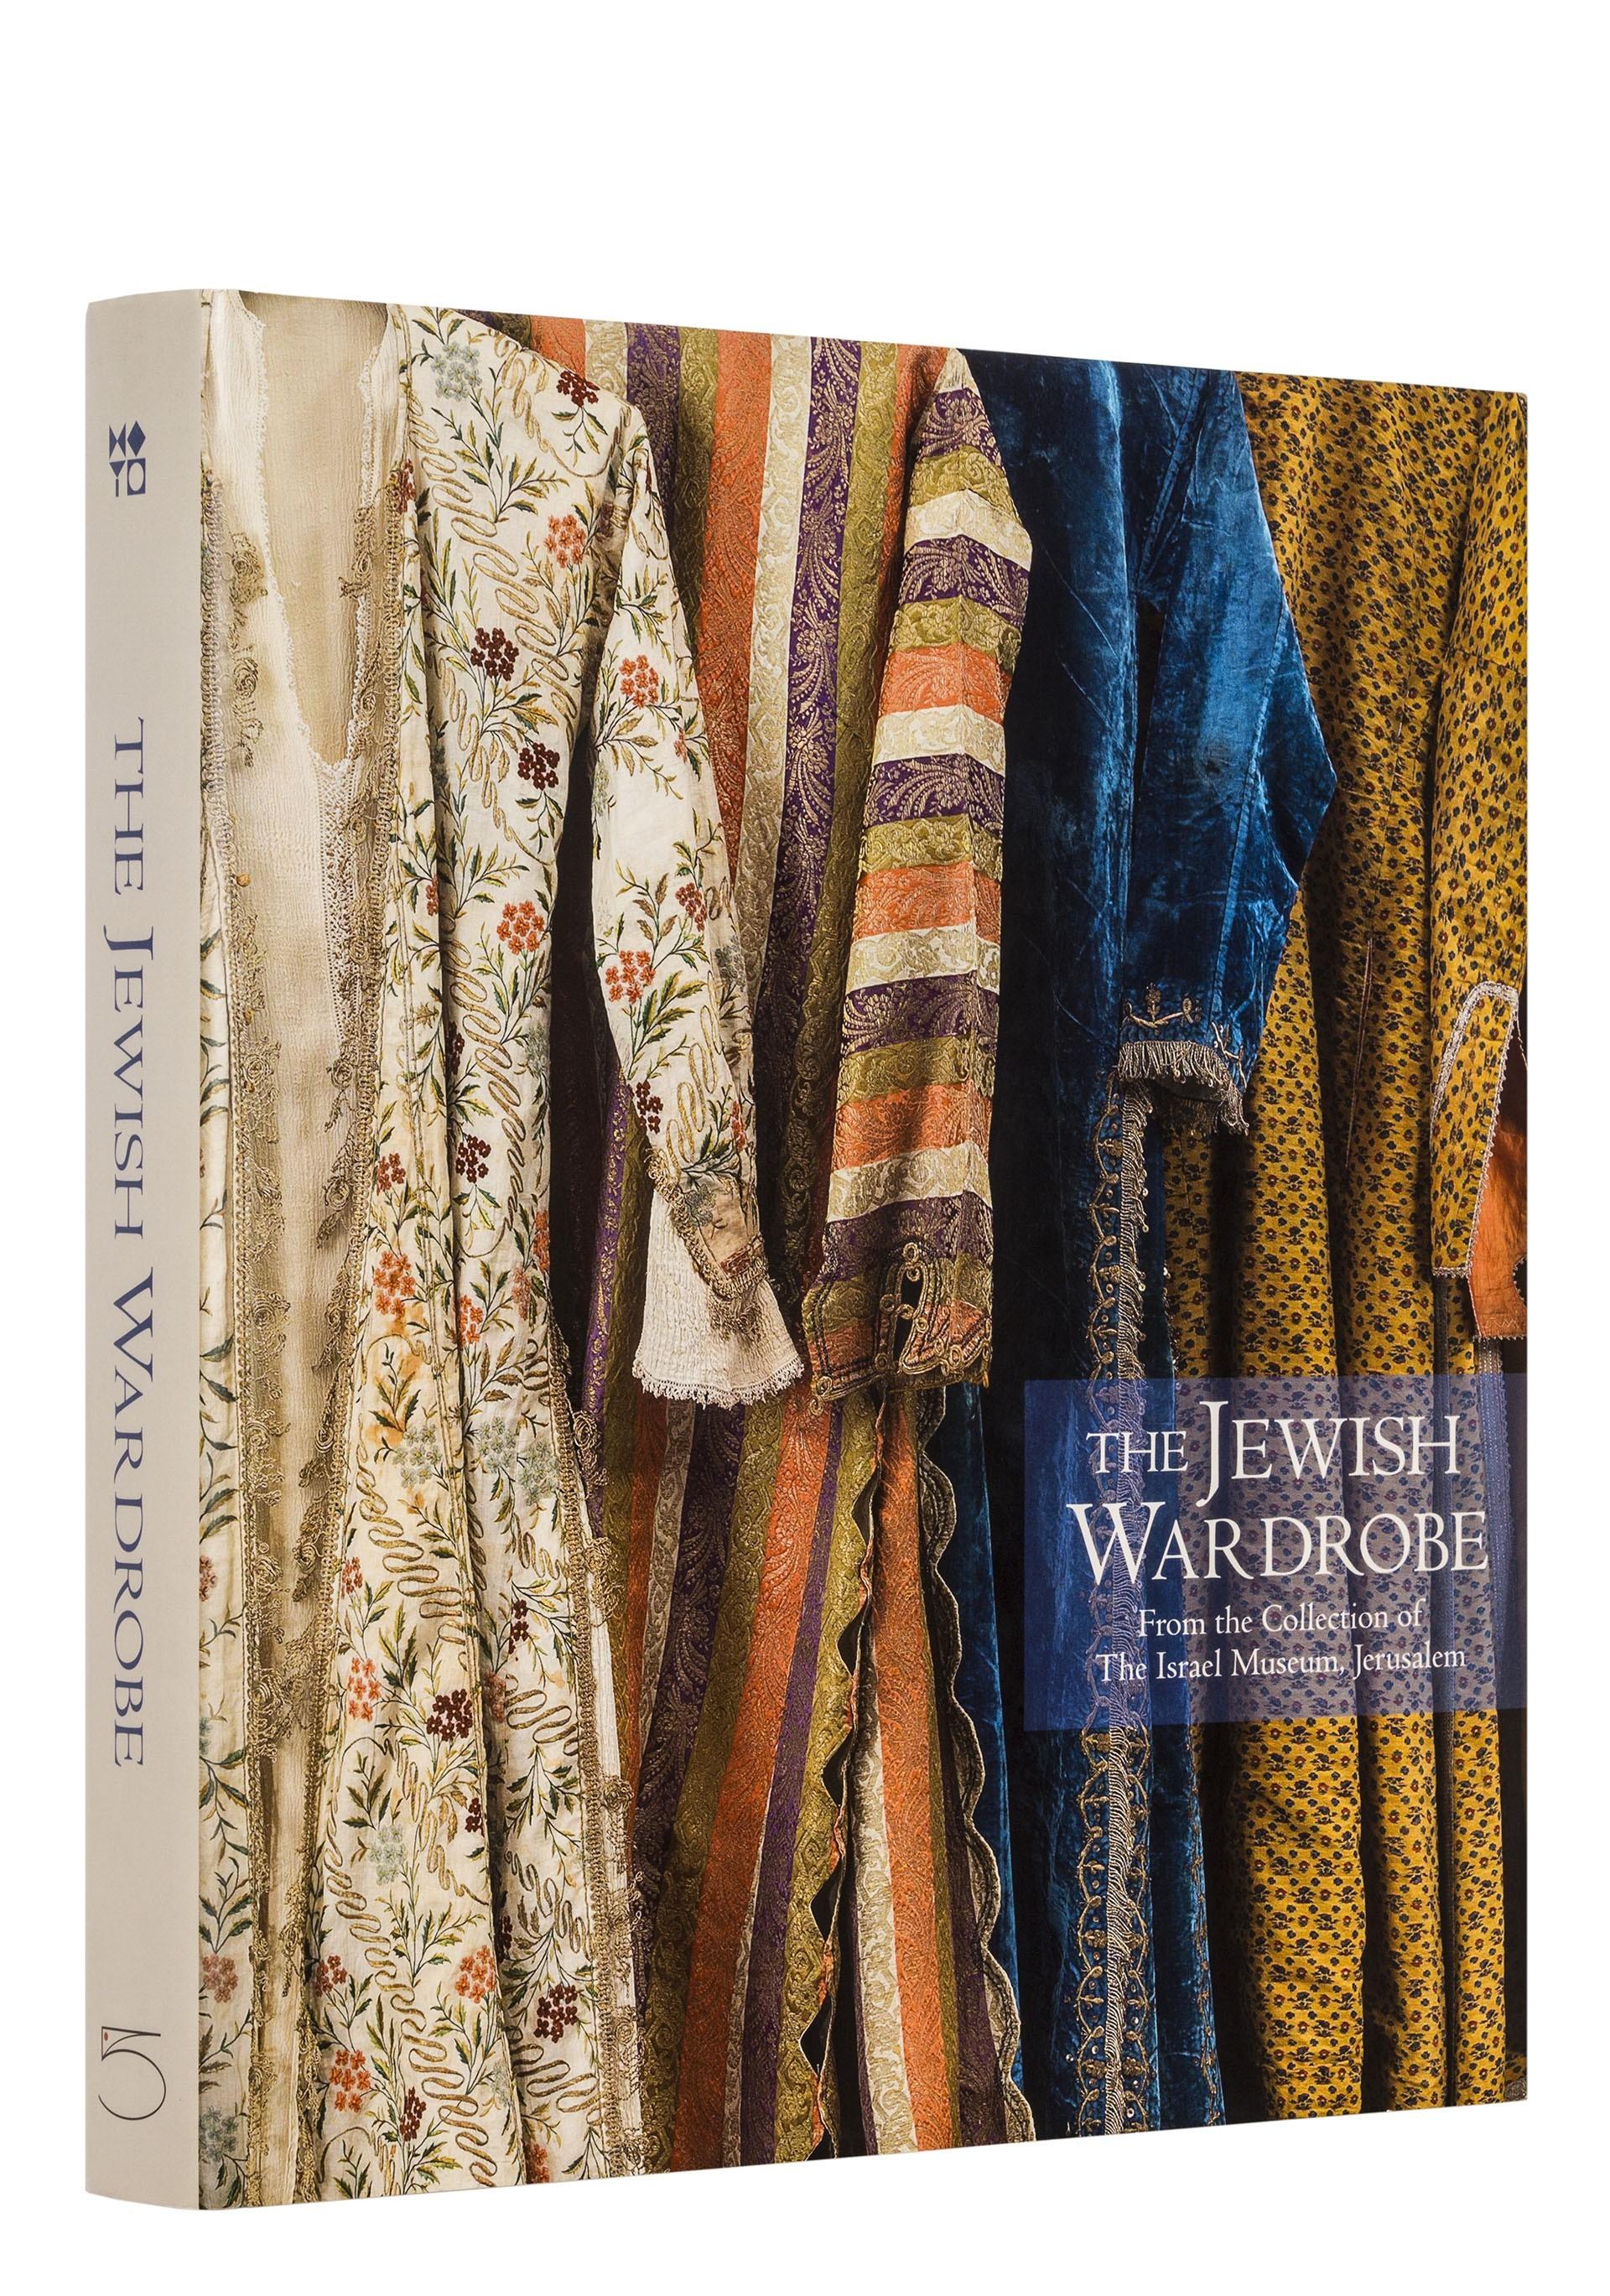 The Jewish Wardrobe